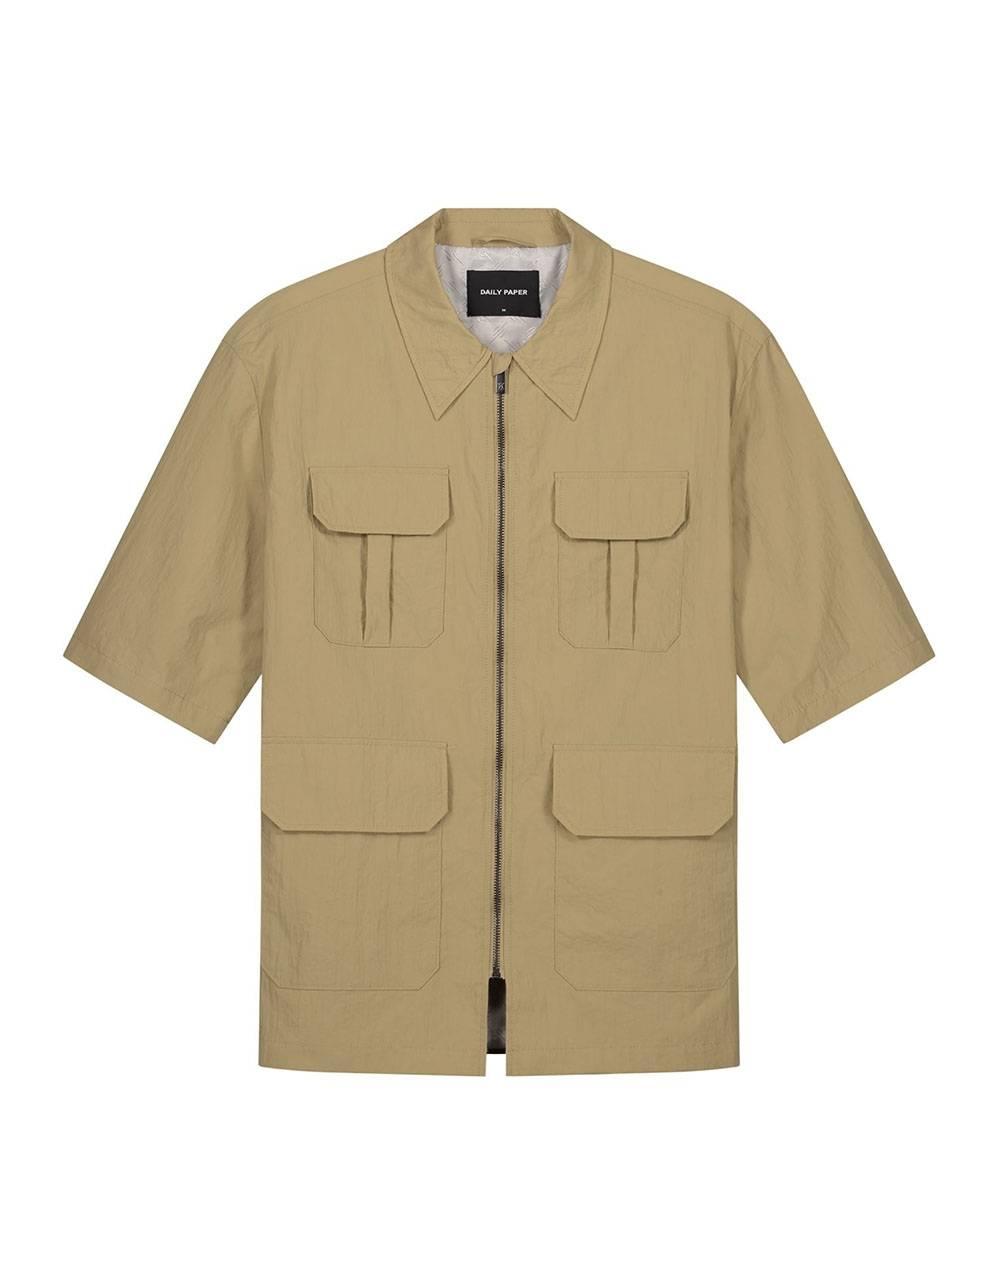 Daily Paper Khalil shirt - beige DAILY PAPER Shirt 165,00€